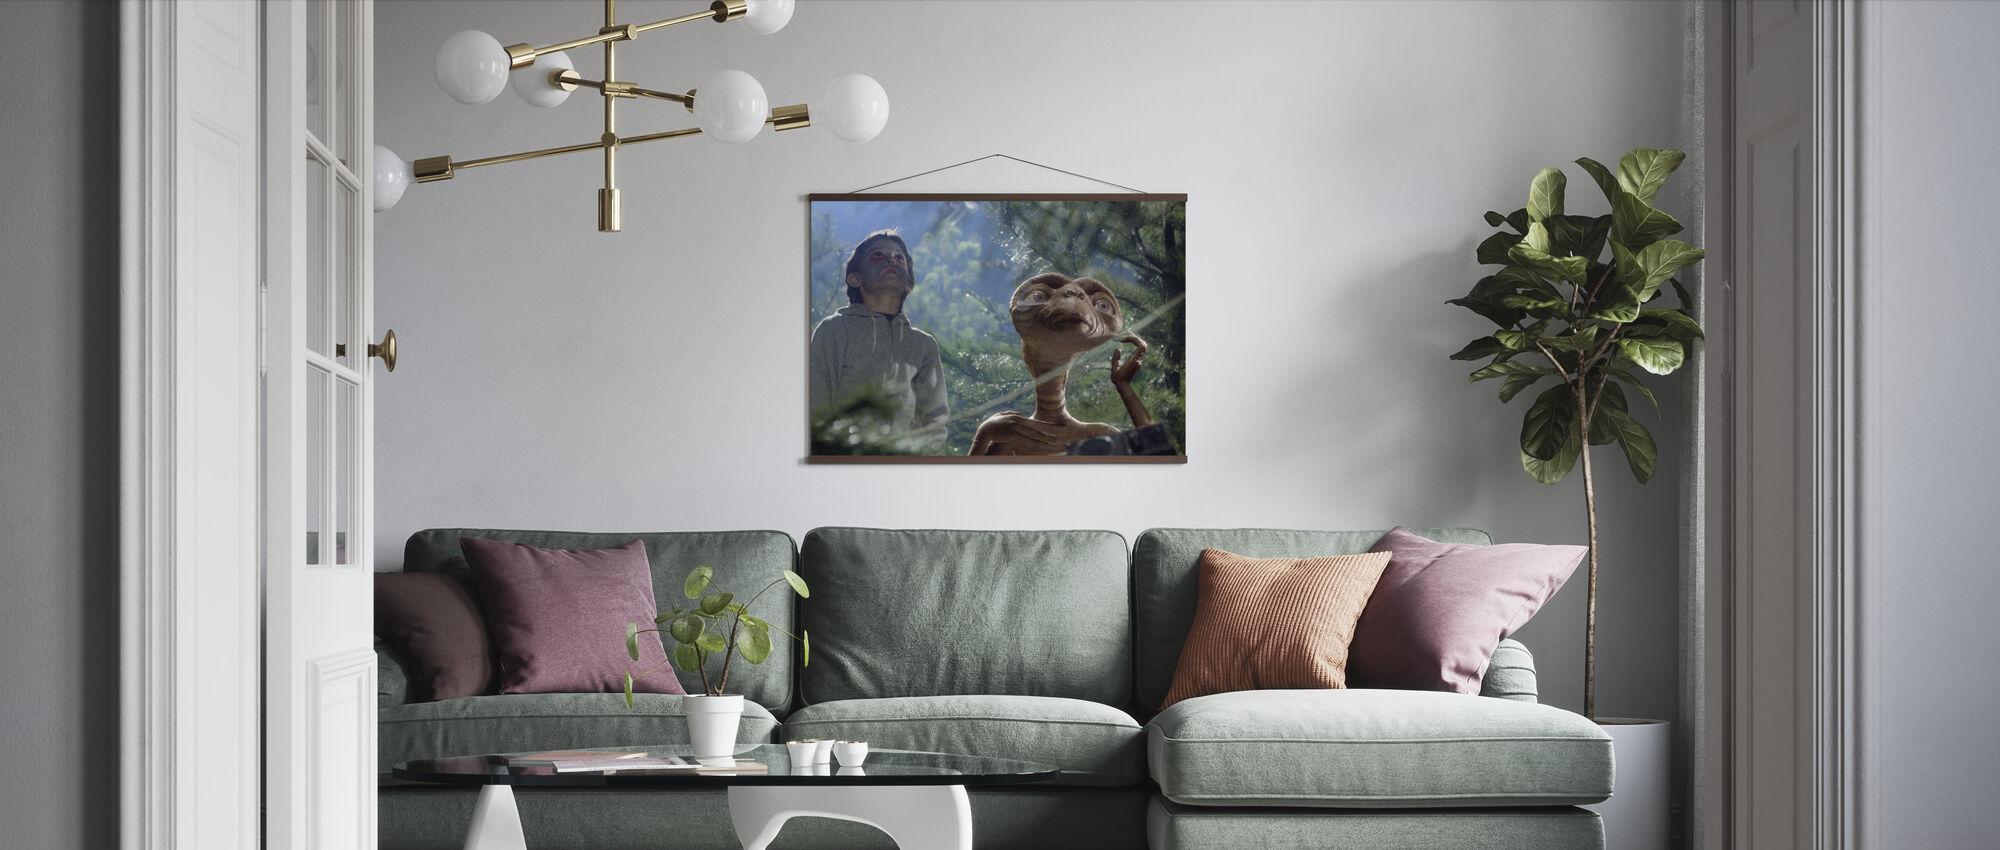 Extra Terrestrial - Henry Thomas - Poster - Living Room